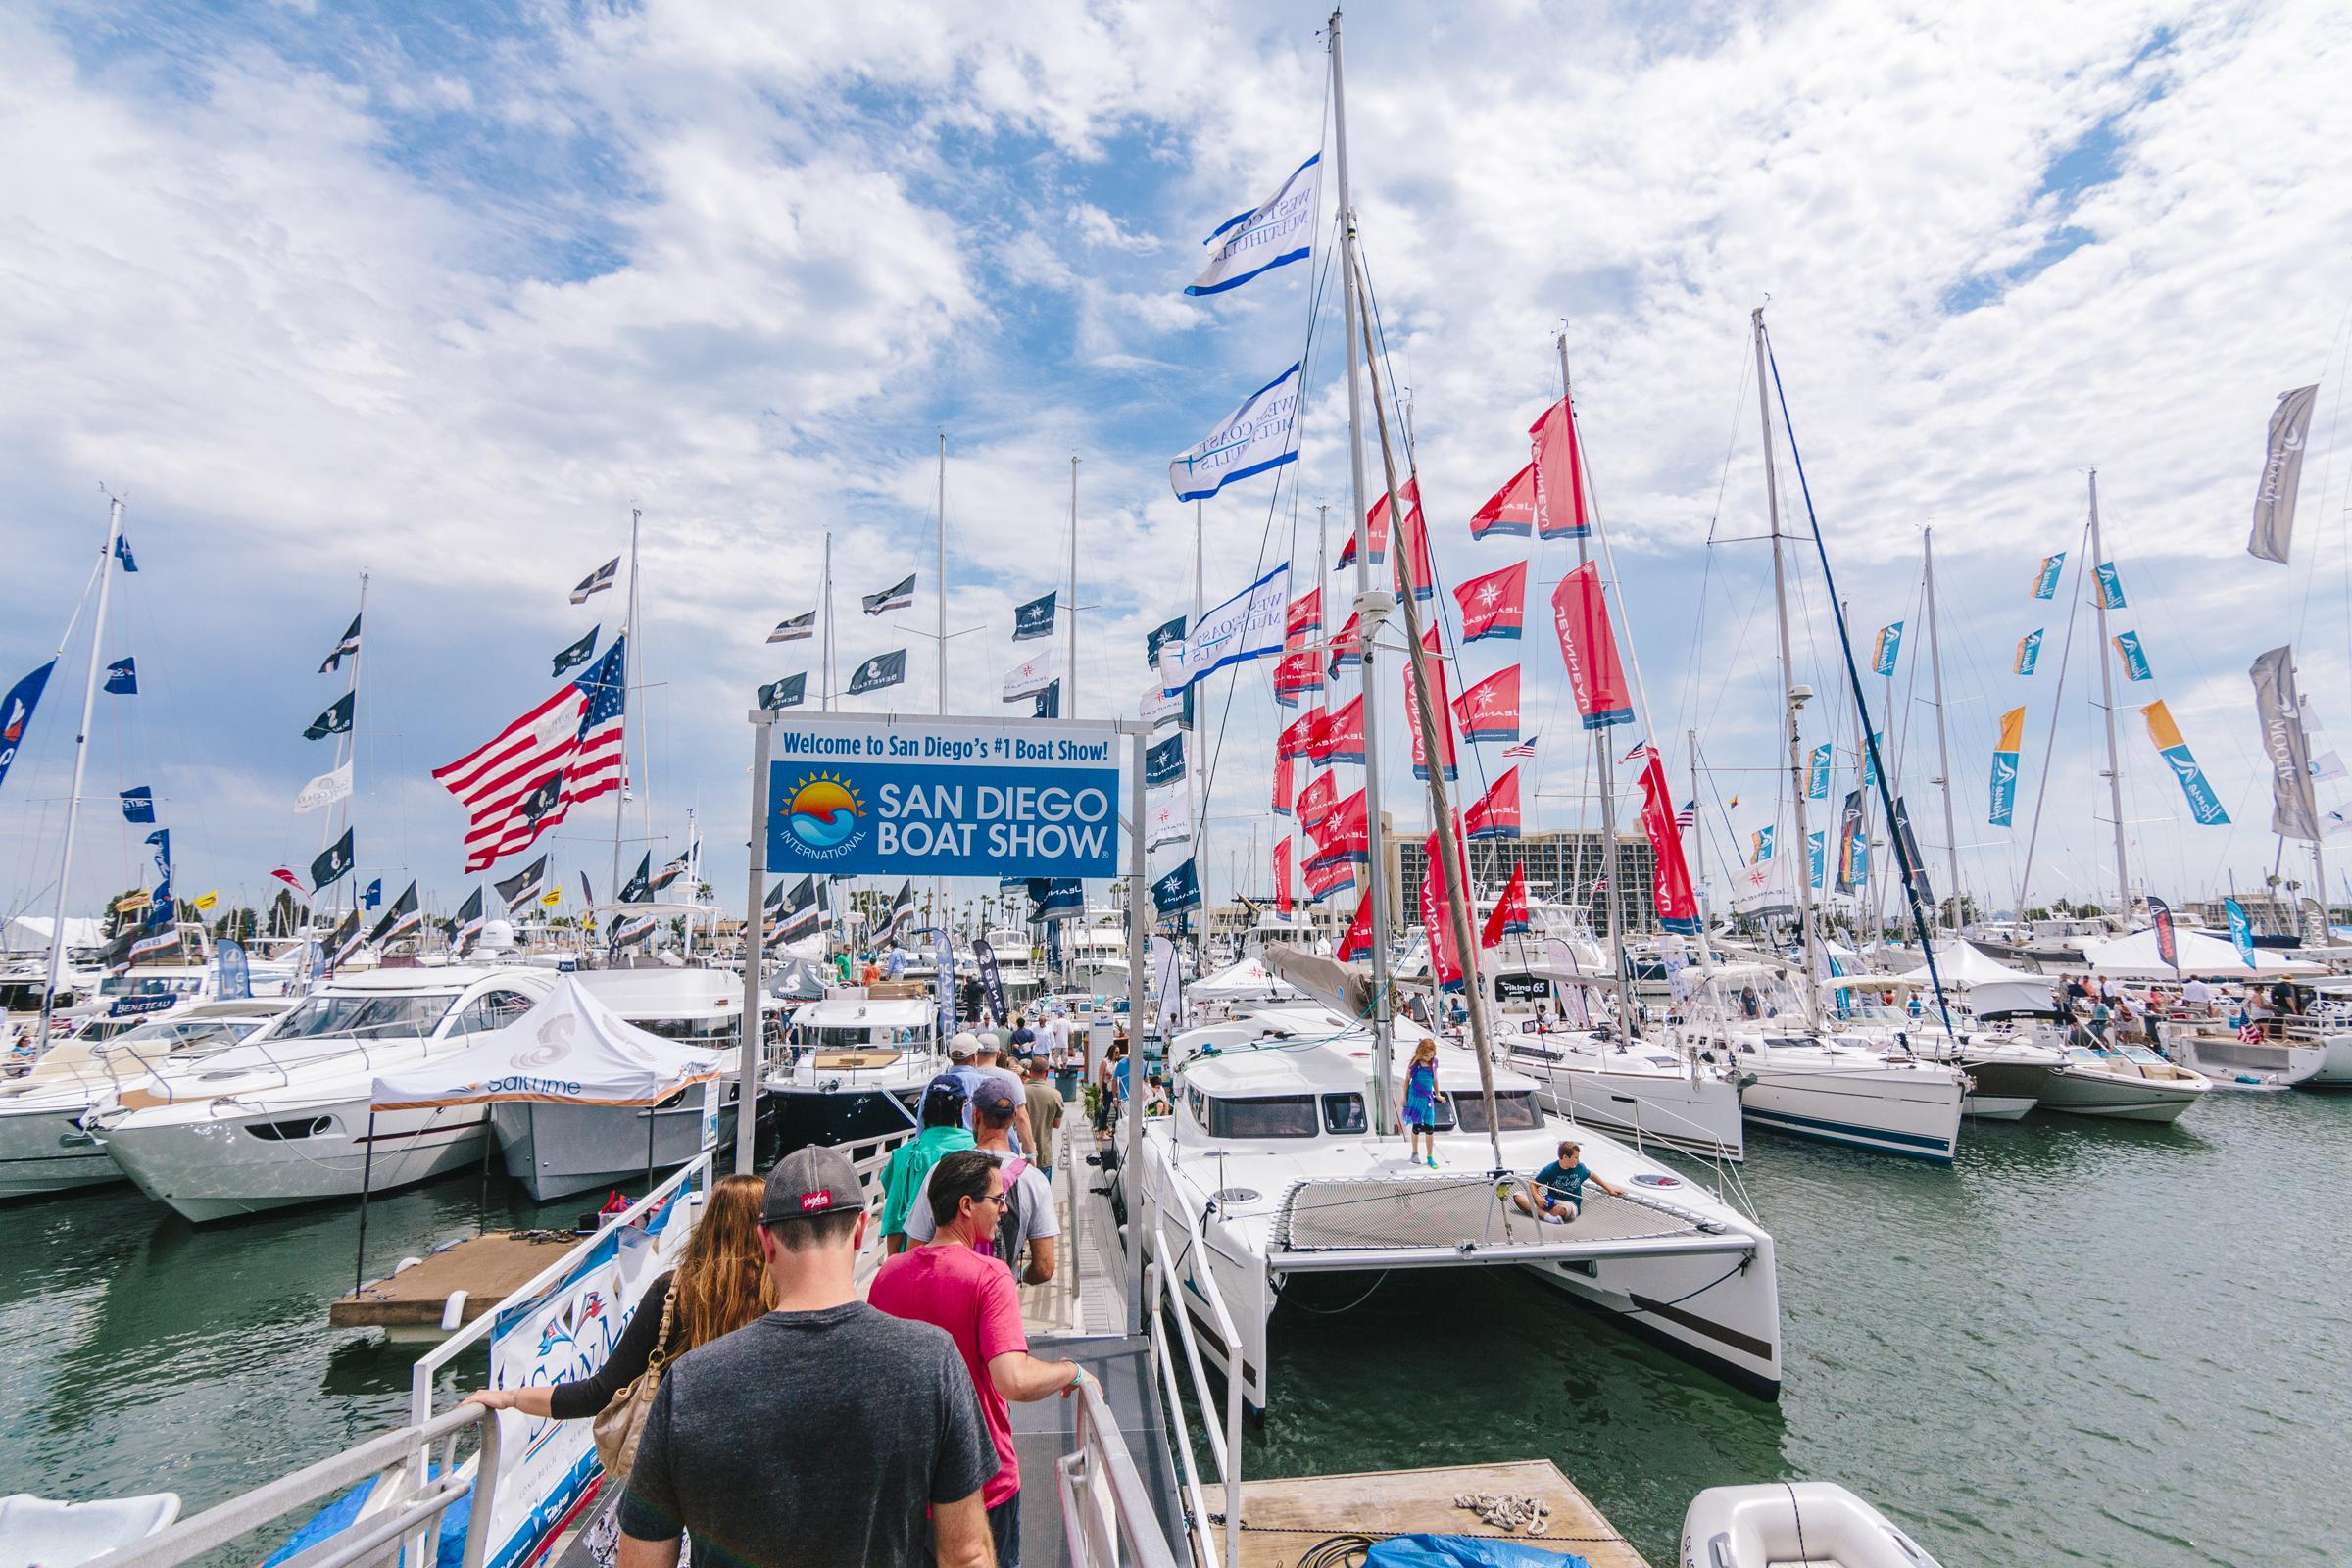 San Diego International Boat Show 2018